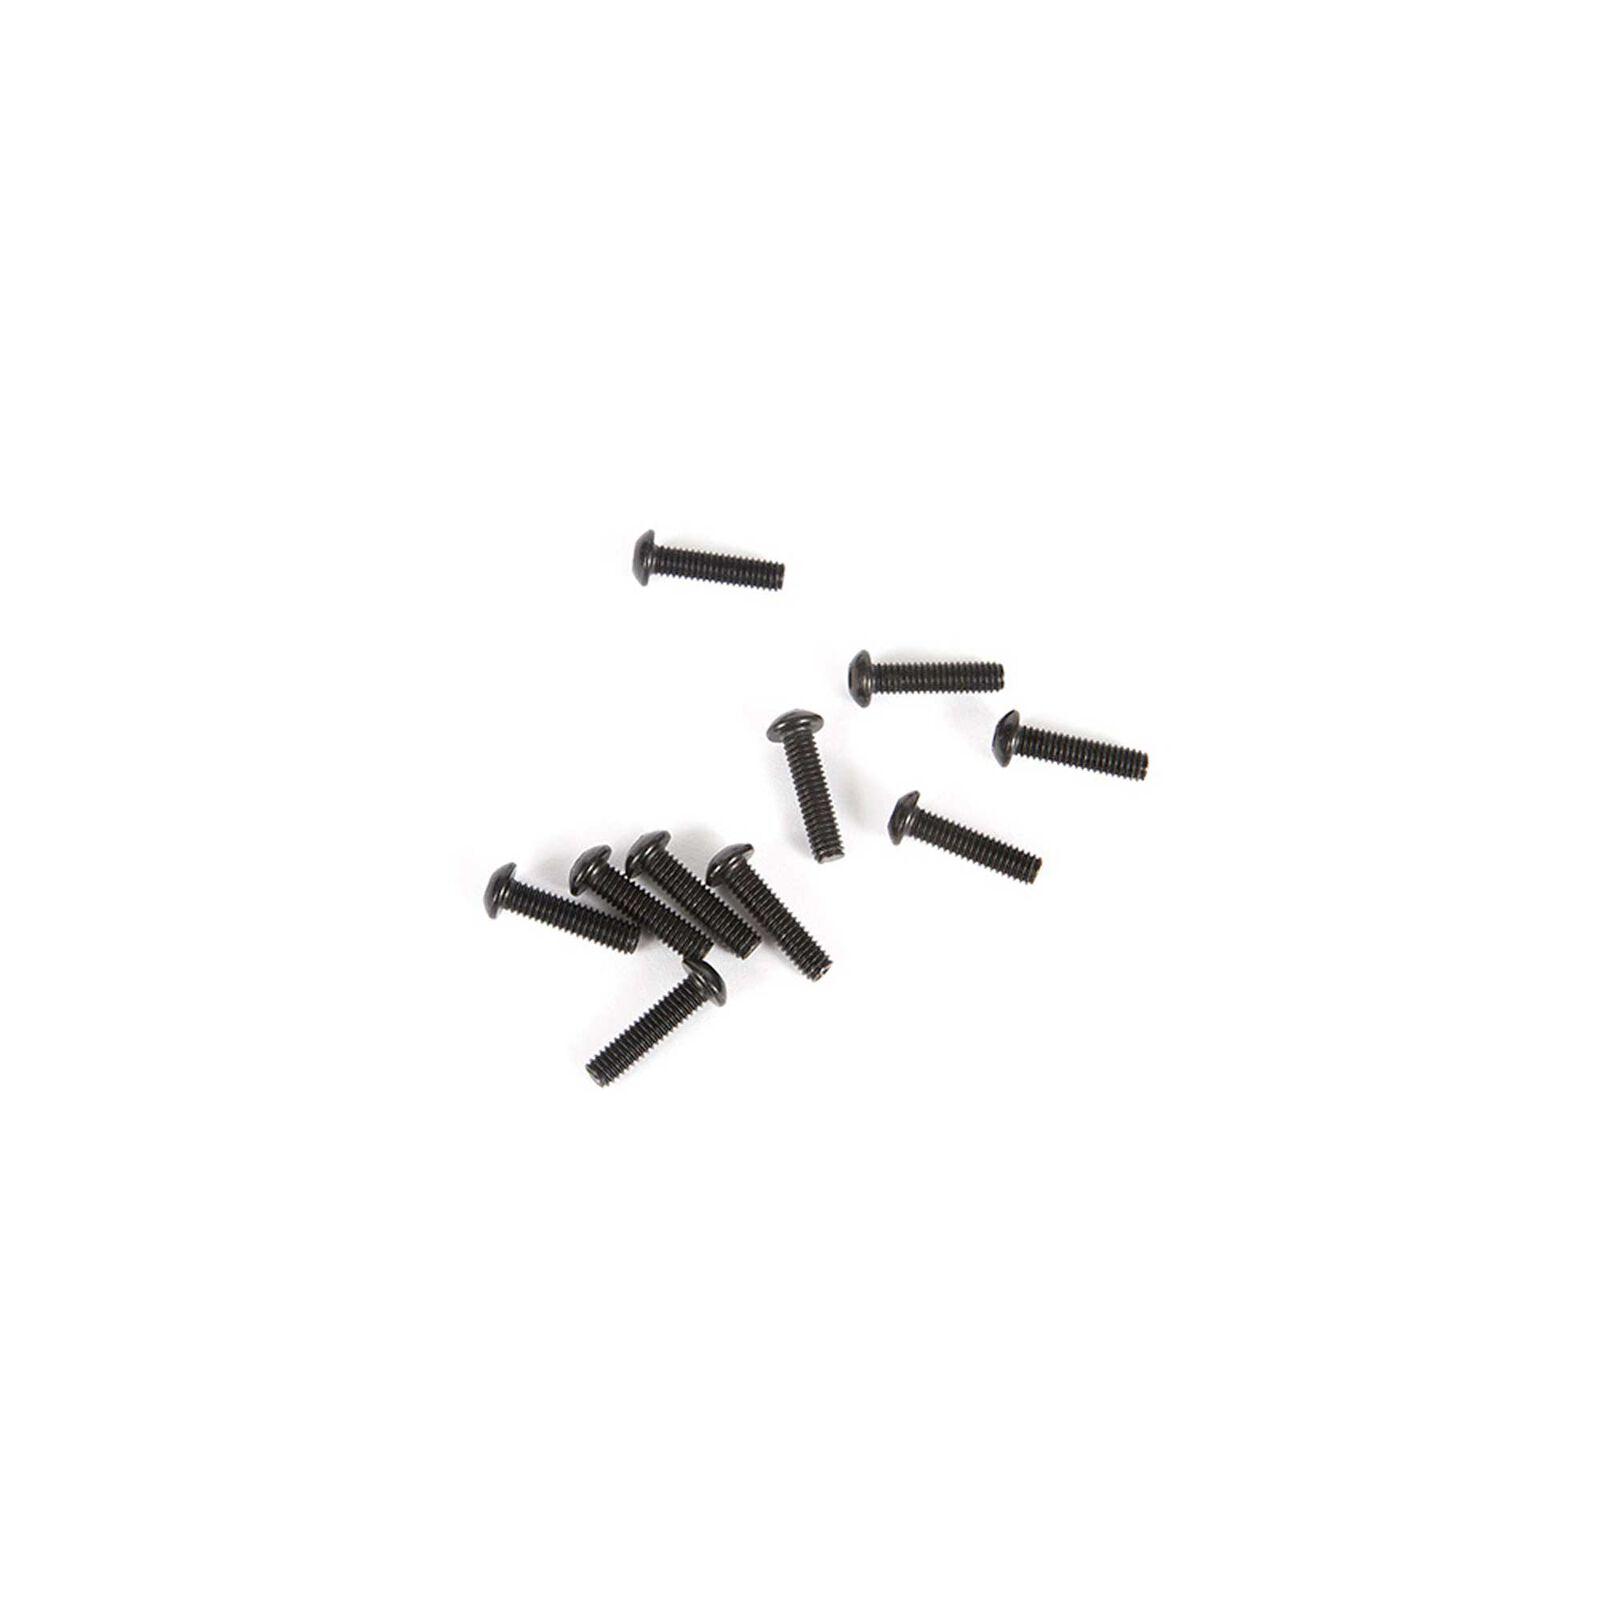 M2.5 x 10mm Button Head Screw (10)